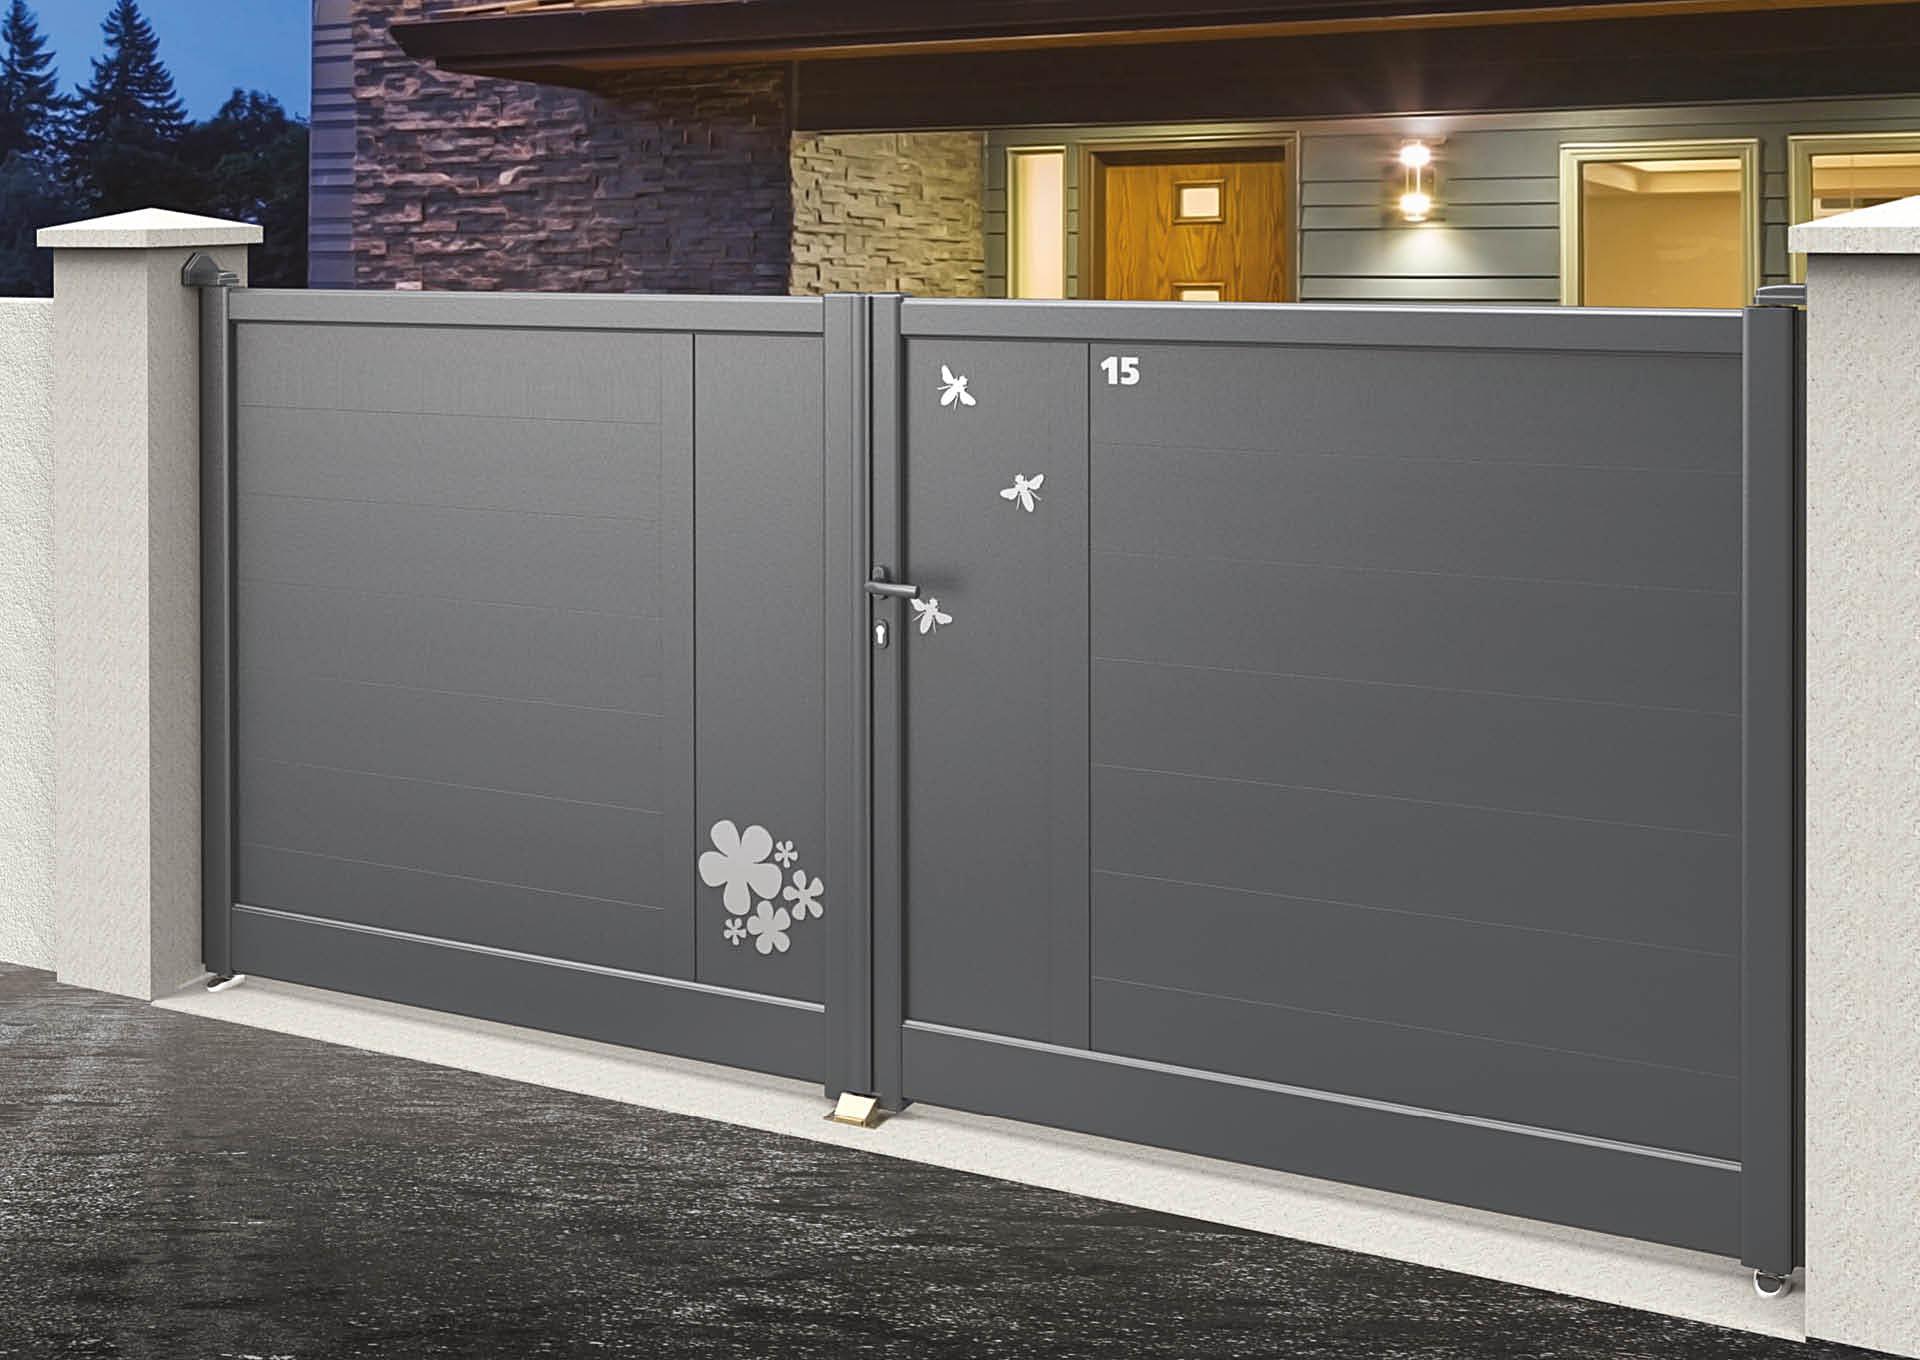 Portail battant en aluminium 9105_B_P2DA Lames horizontales 200mm + décor alu brossé Butinage